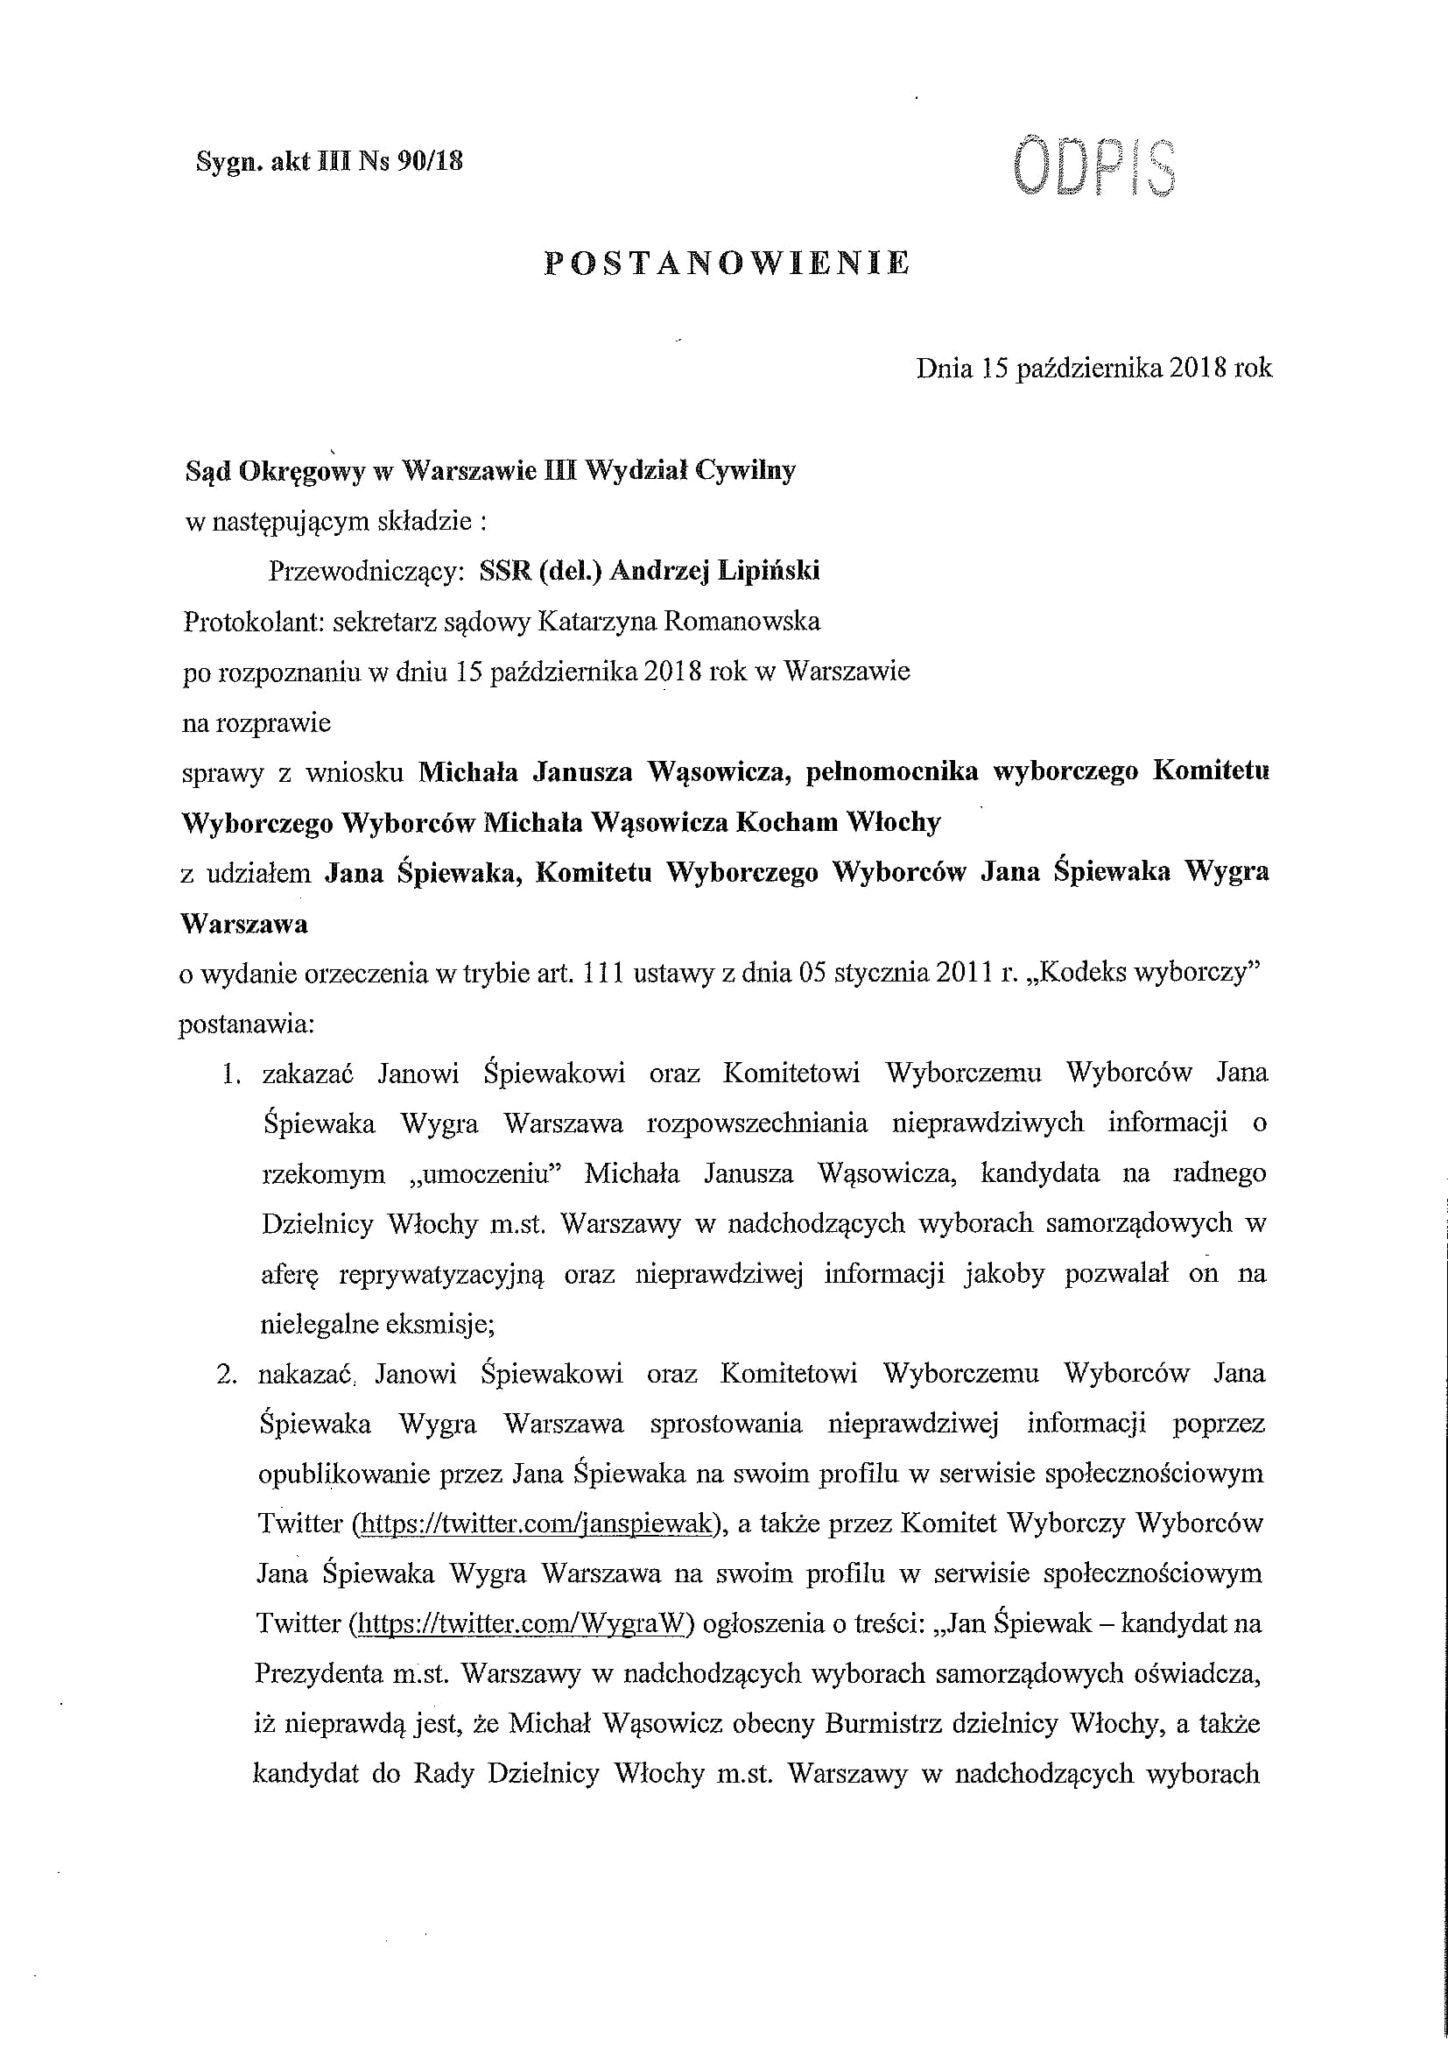 uzasadnienie III Ns 90-18-011str